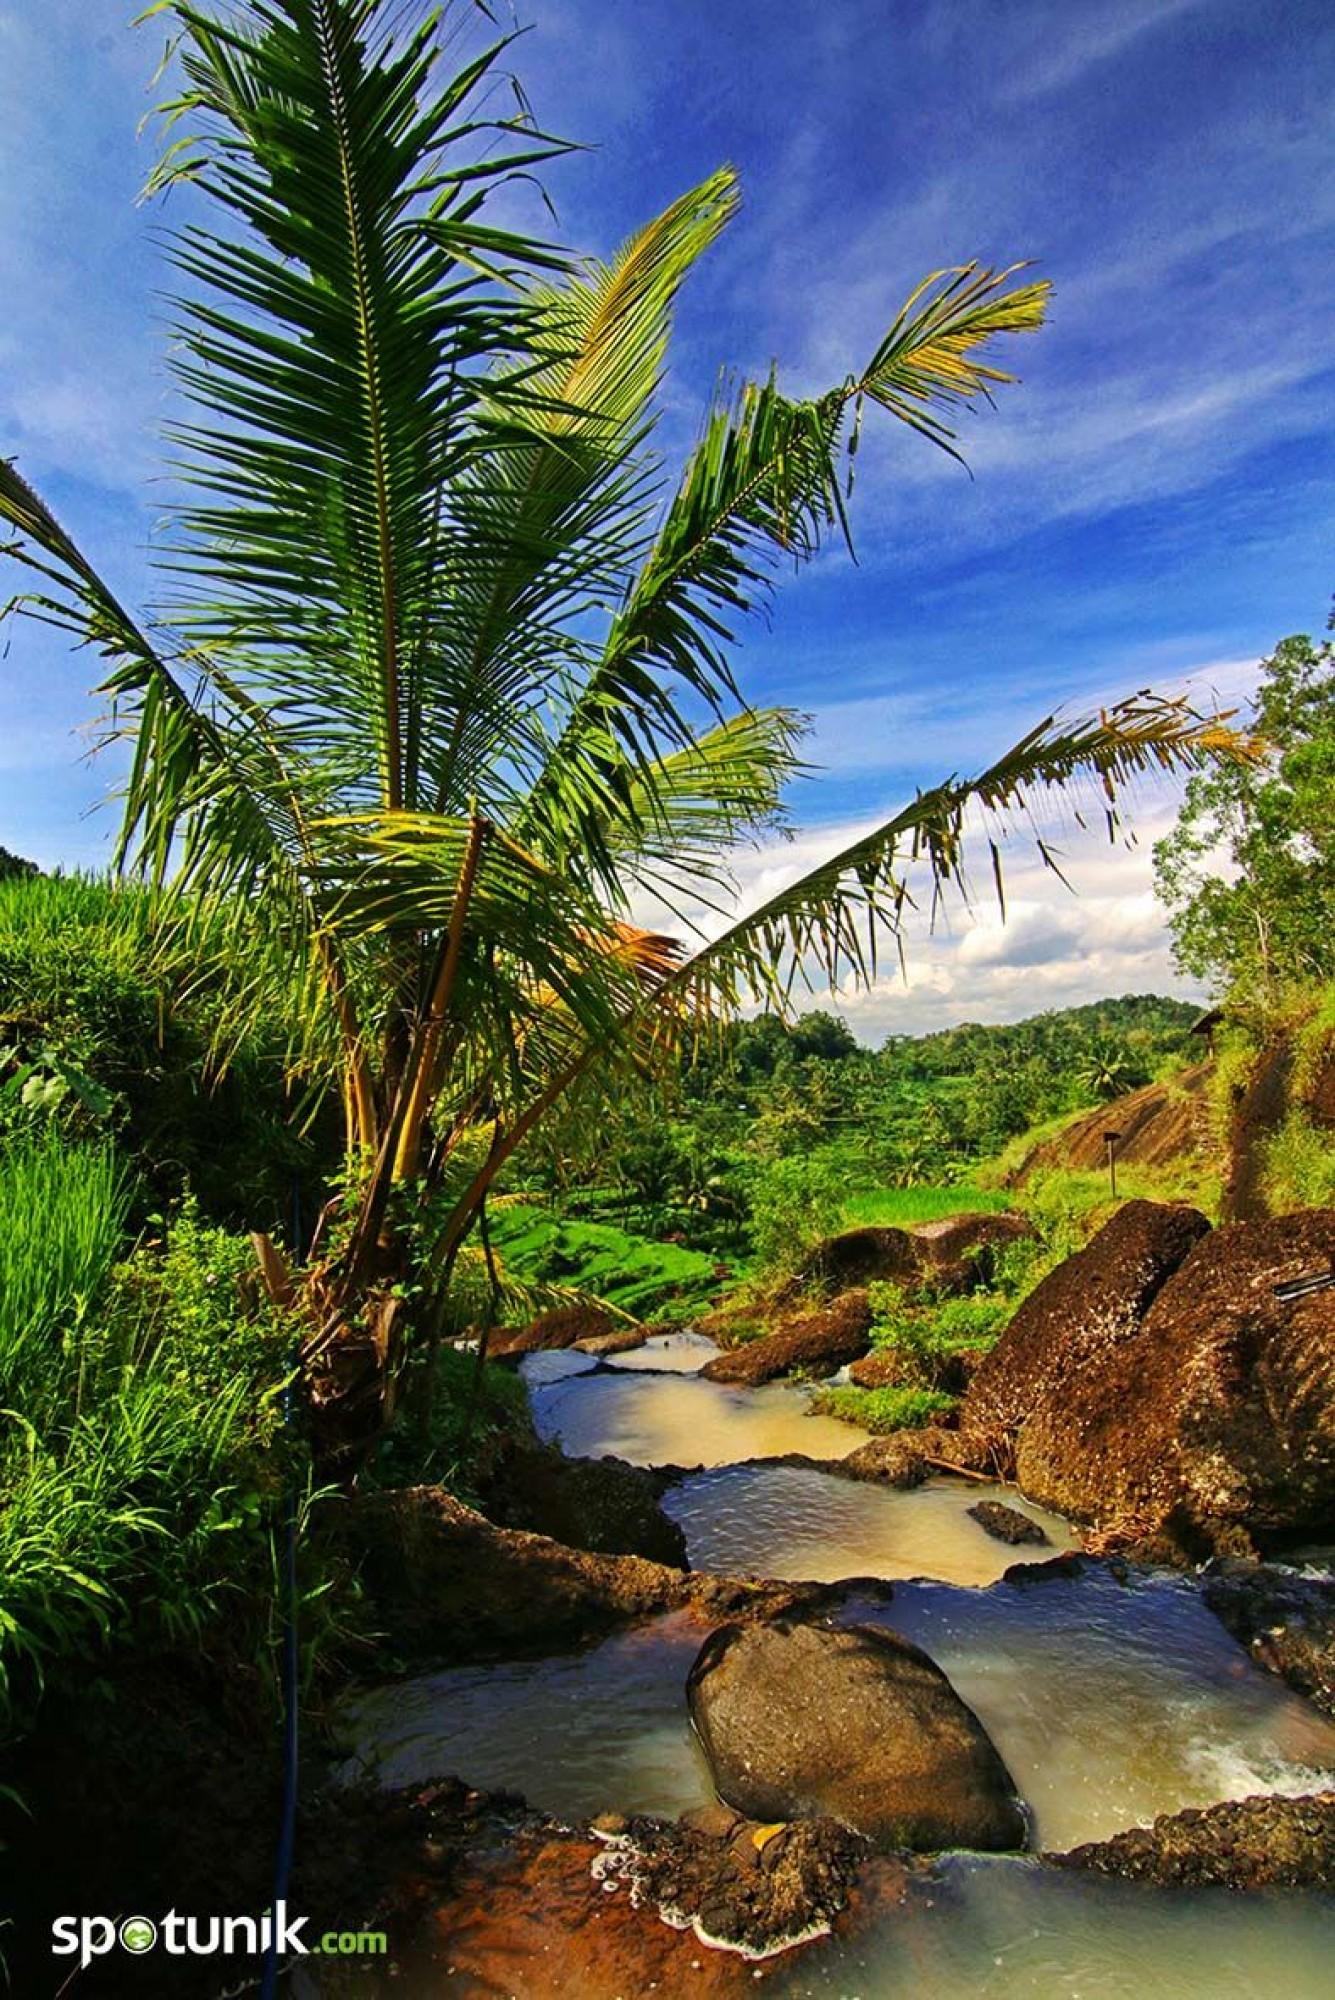 Air Terjun Kedung Kandang Pesona Patuk 20160602102122 Jpg Kab Gunungkidul